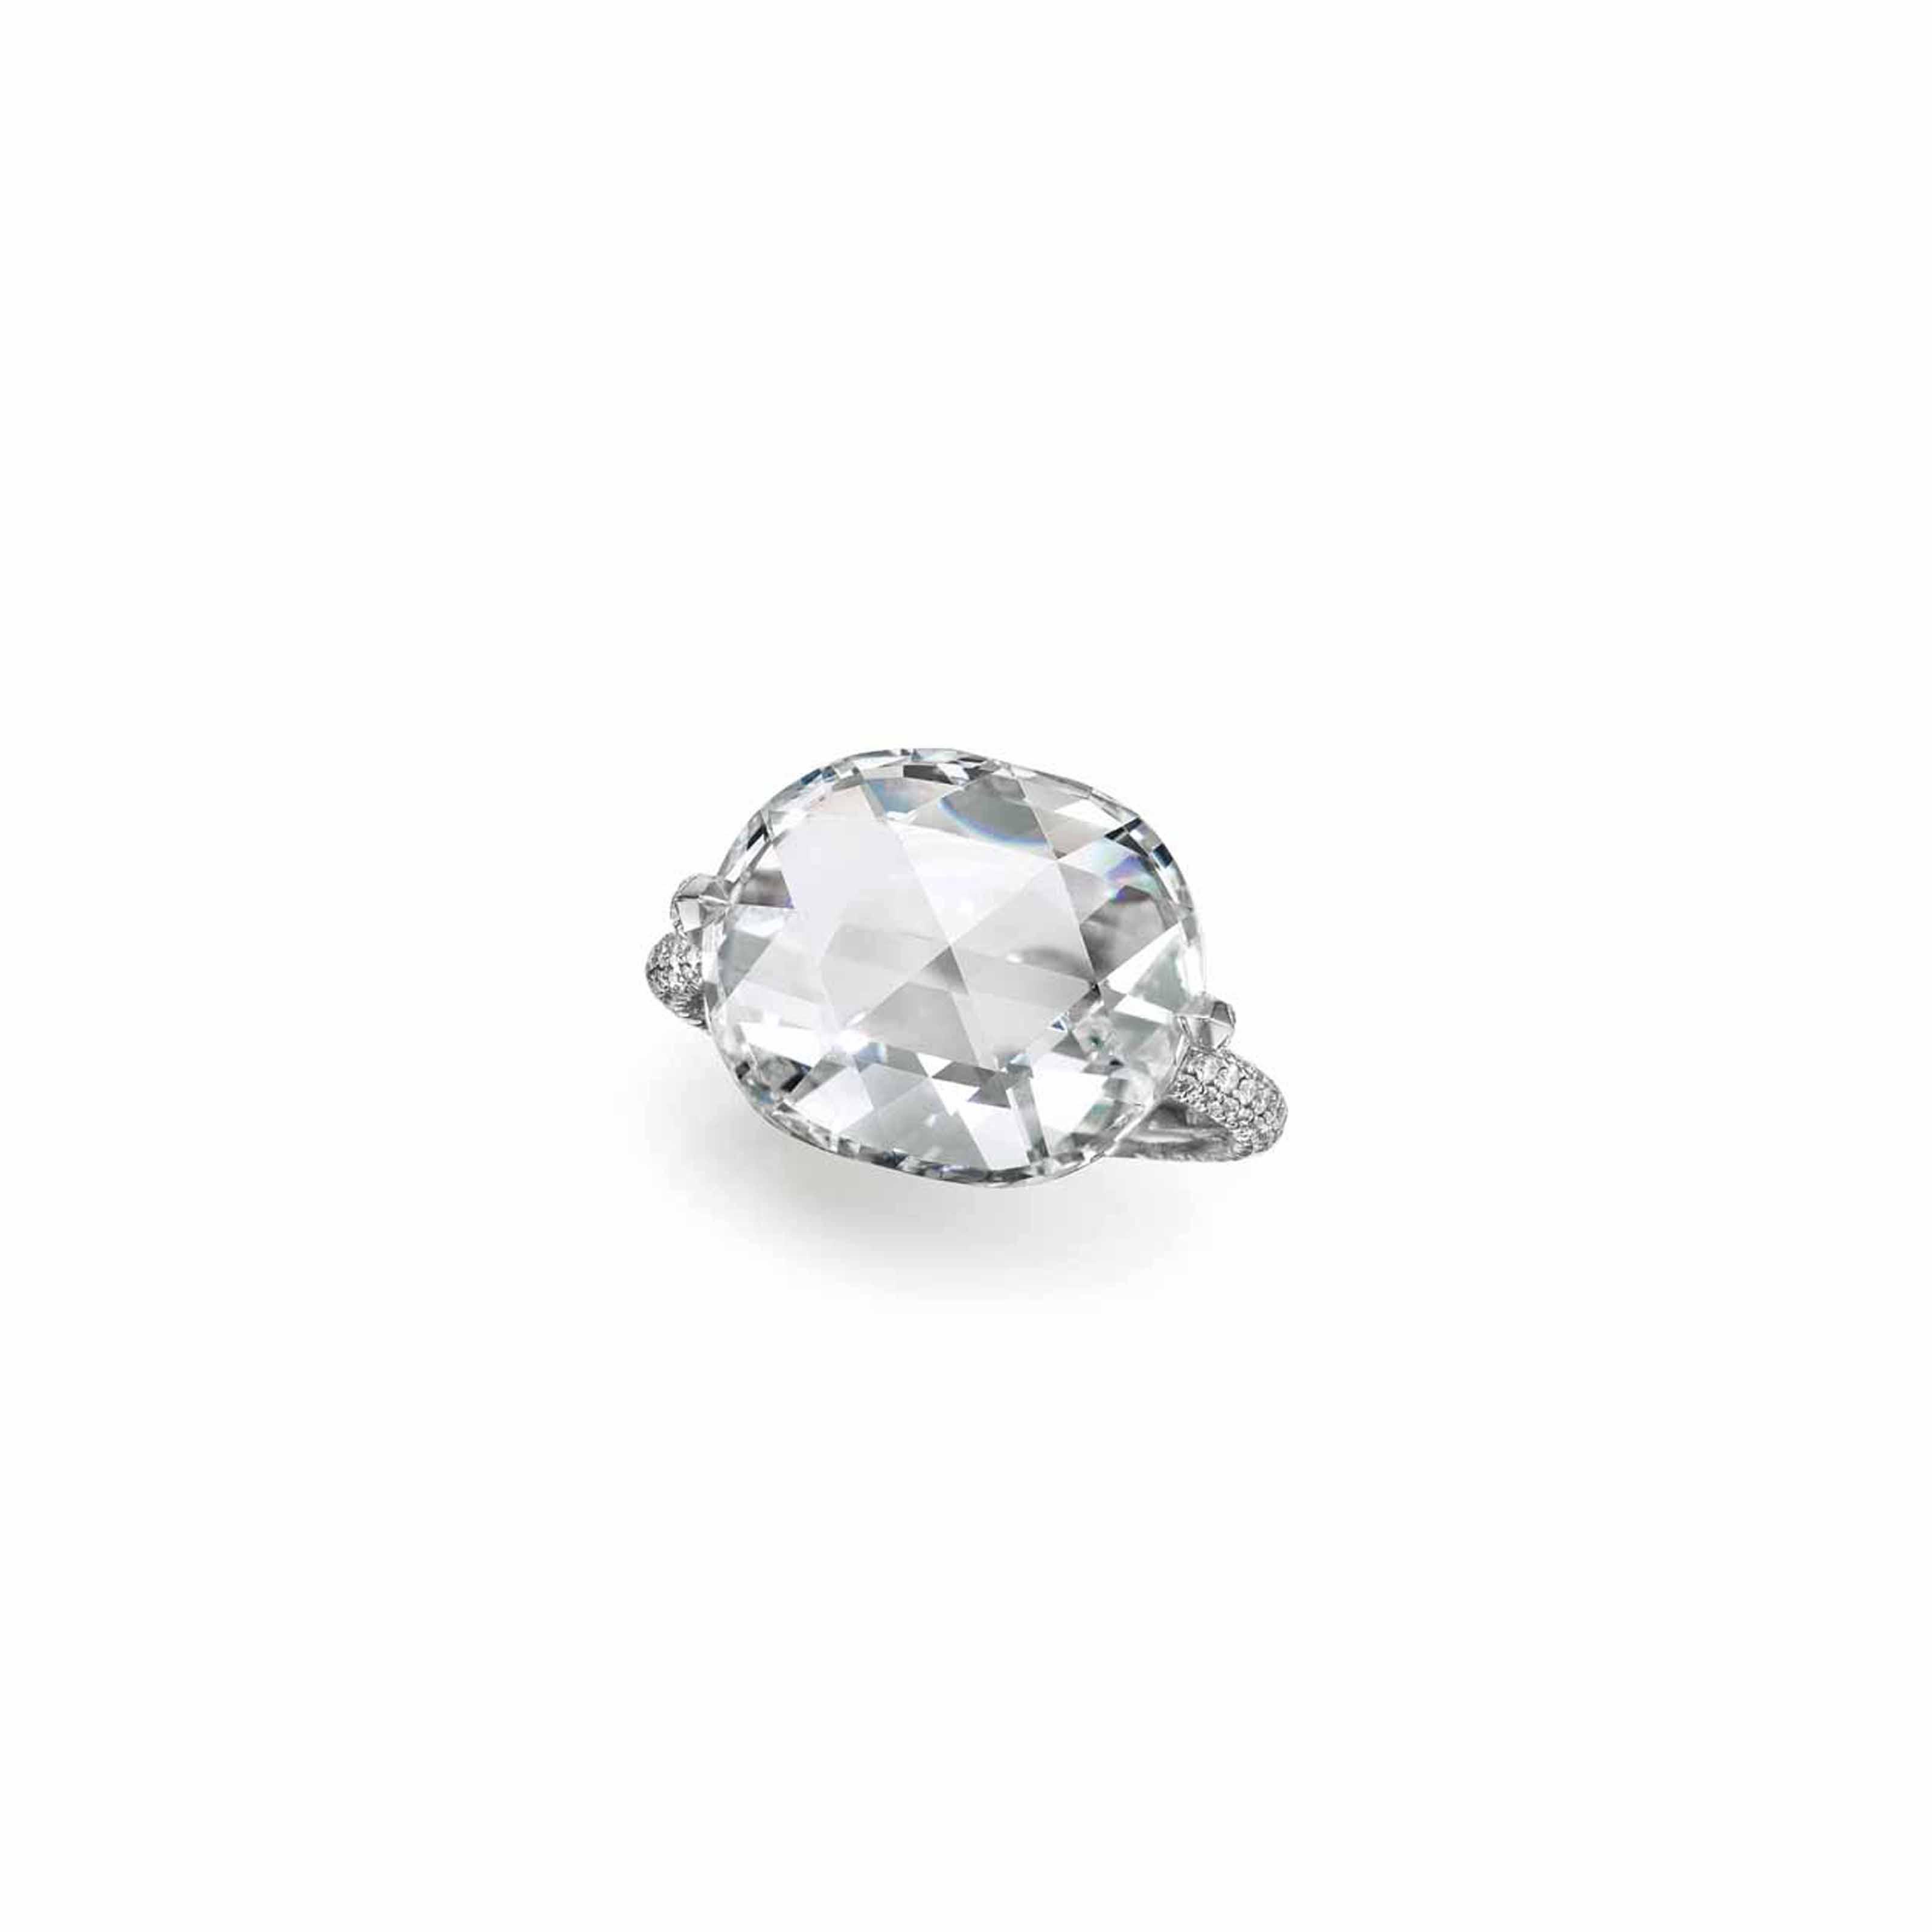 SABBADINI. A DIAMOND RING